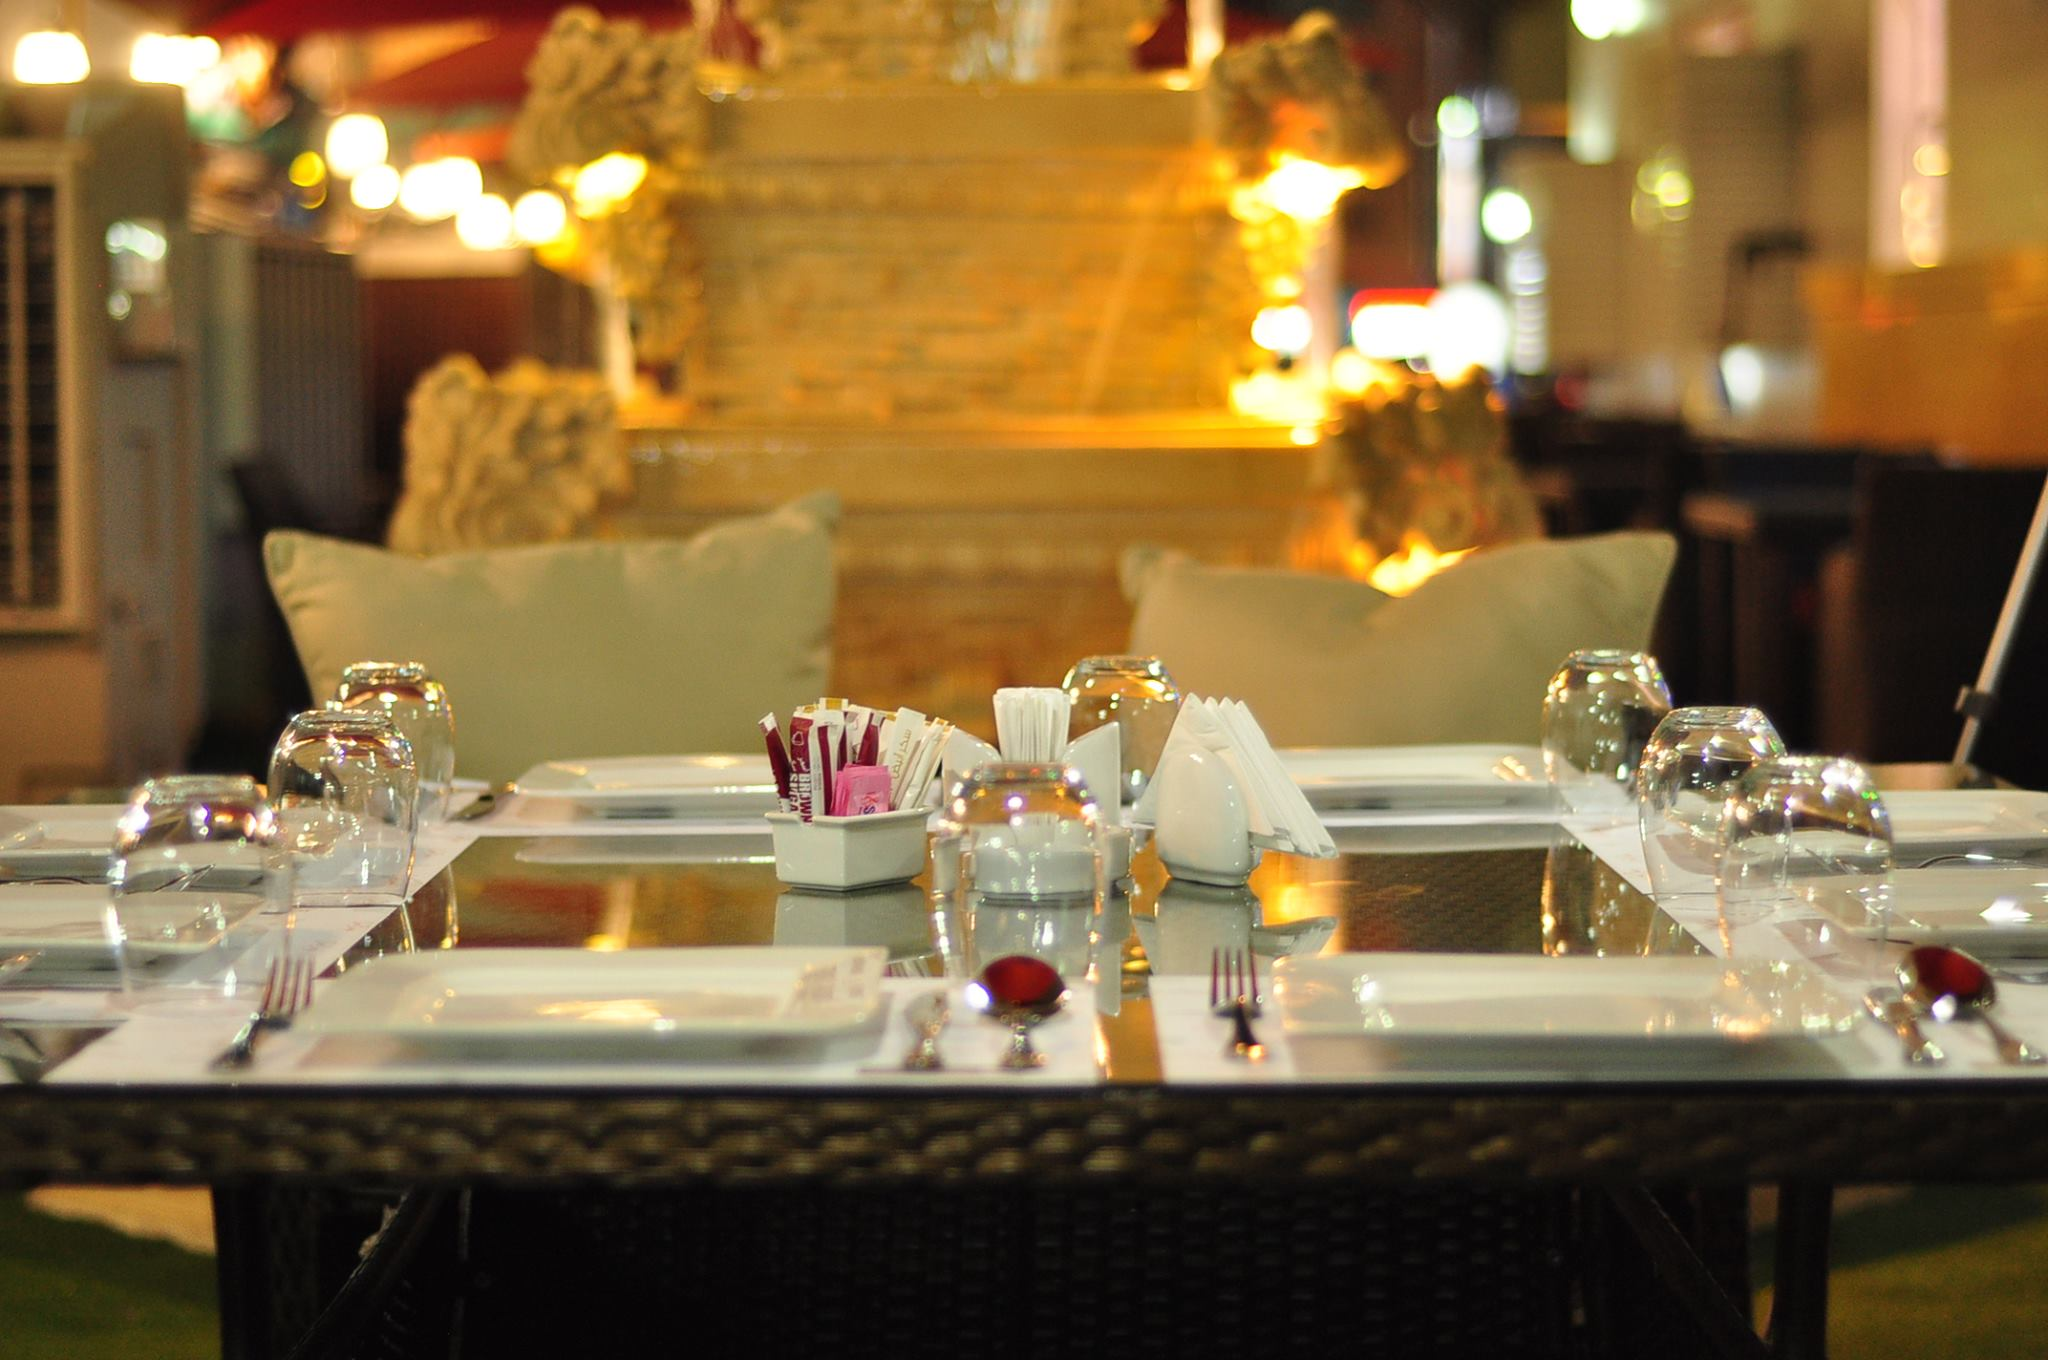 Chebogz filipino restaurant in abu dhabi is what you re for Ristorante cipriani abu dhabi